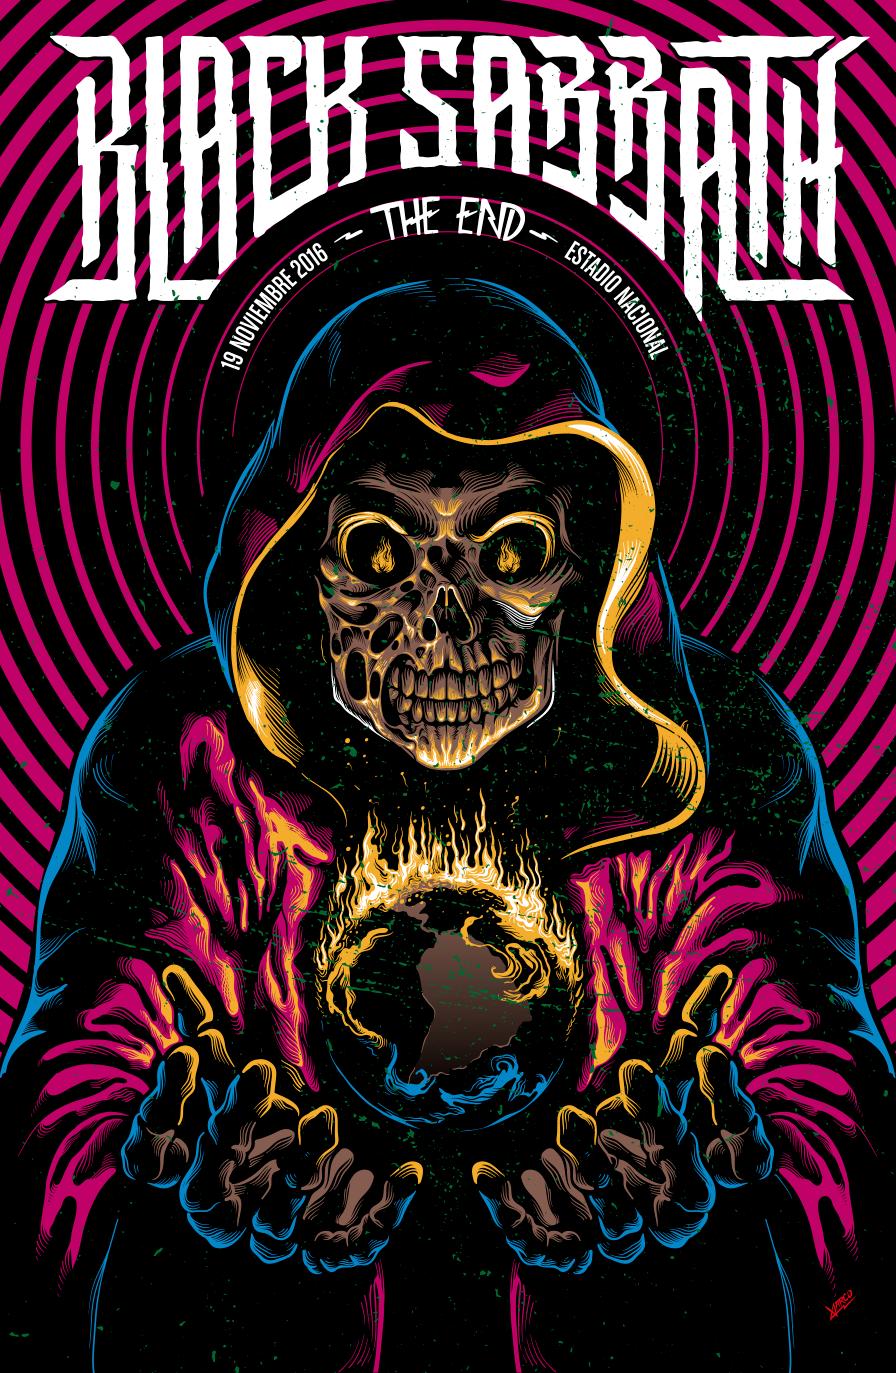 M.J. Lew Guitar Hero Art Poster Print - 12x24 Art Poster Print by M.J. Lew, 24x12